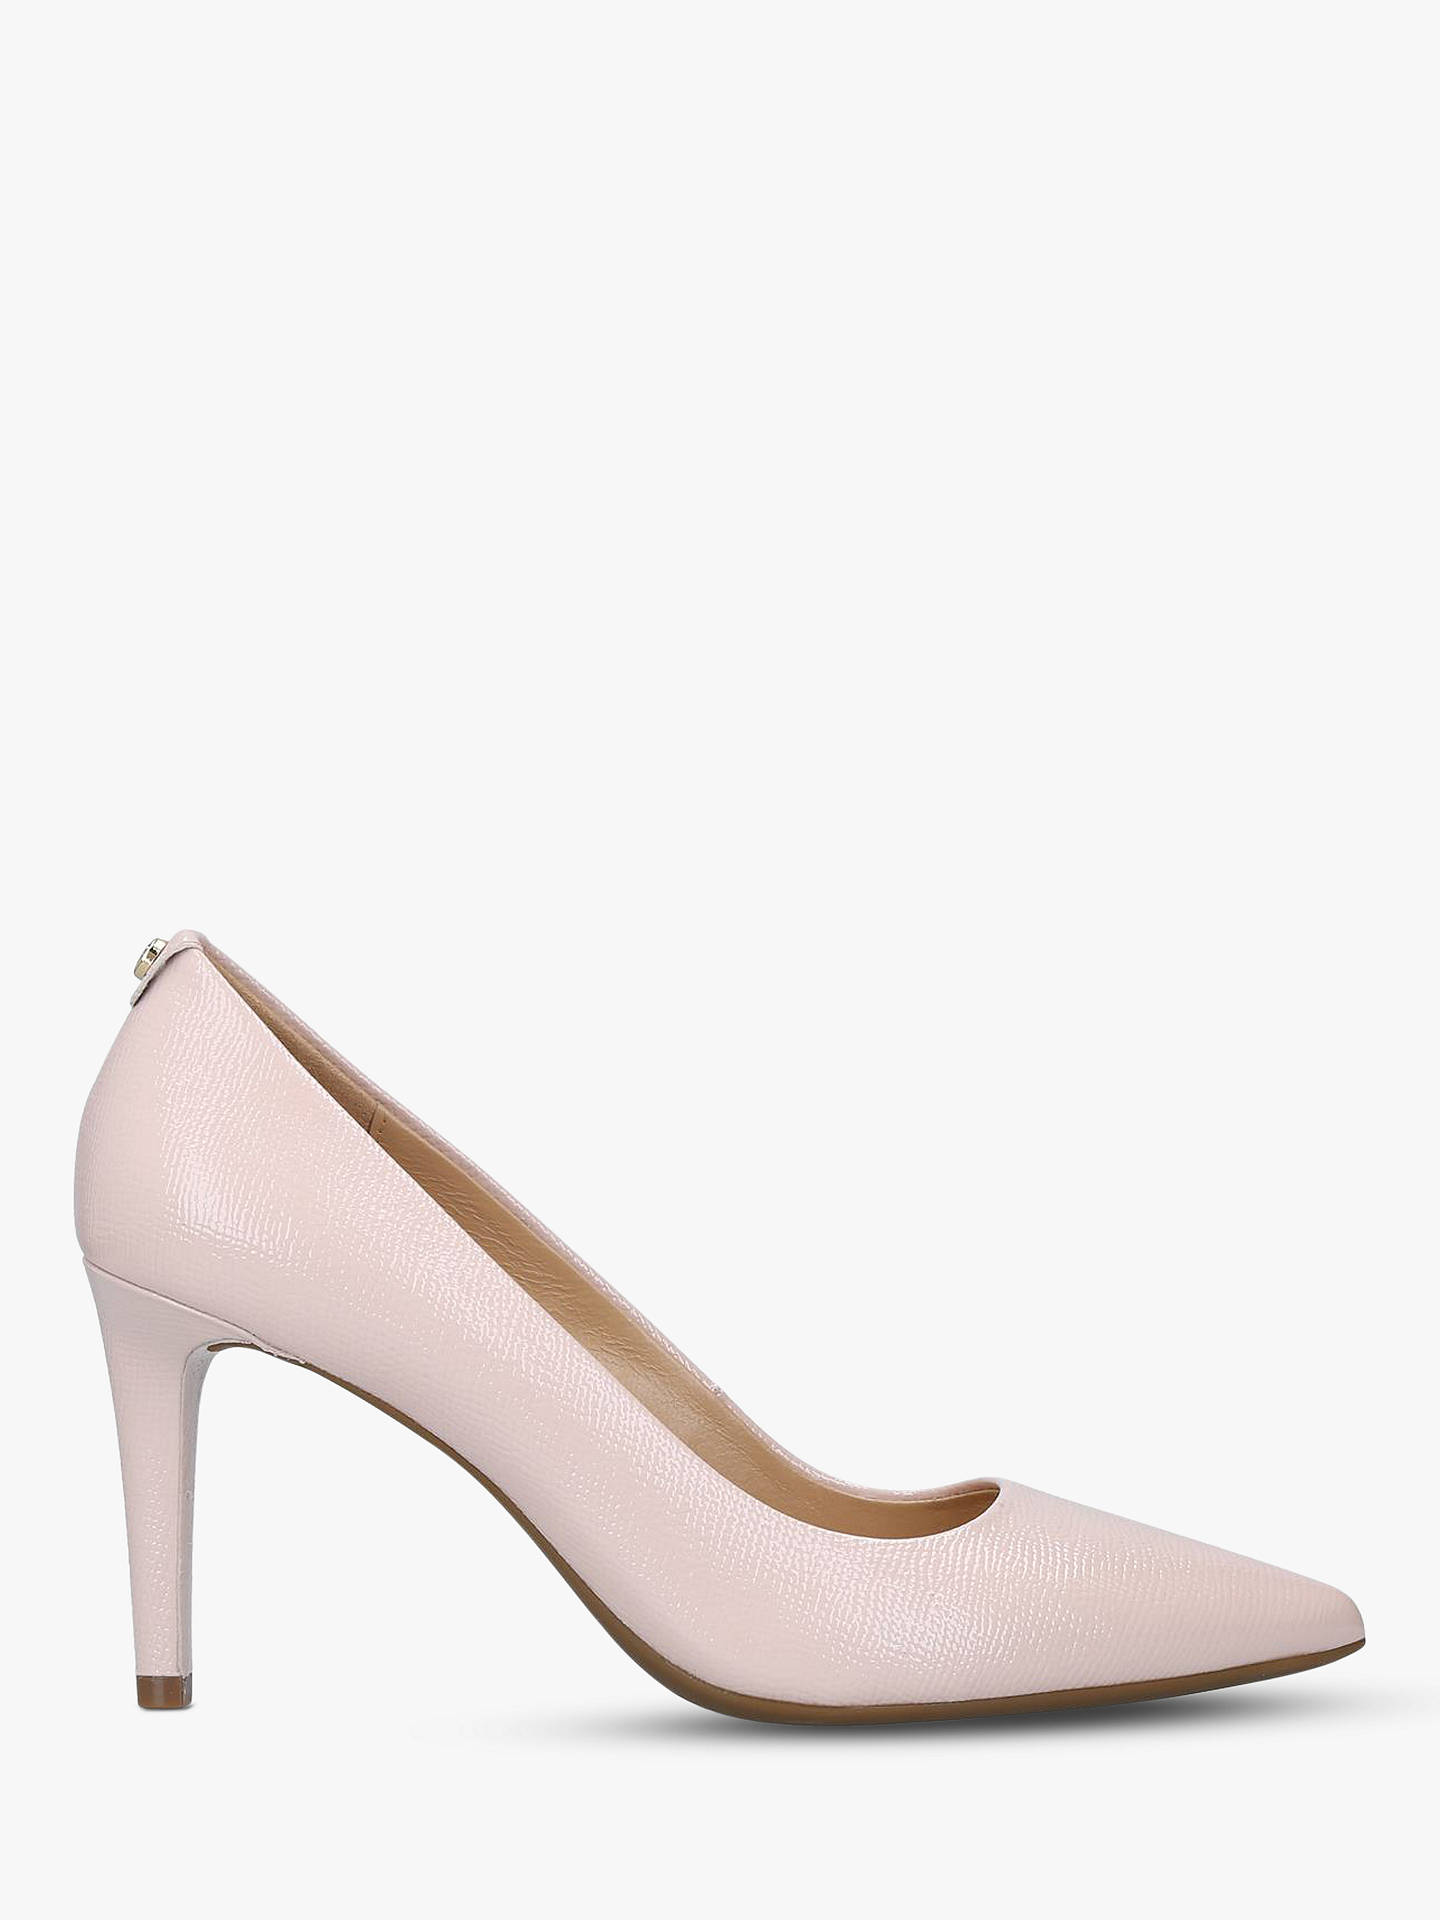 40affdd4b4b MICHAEL Michael Kors Dorothy Flex Pointed Court Shoes at John Lewis ...